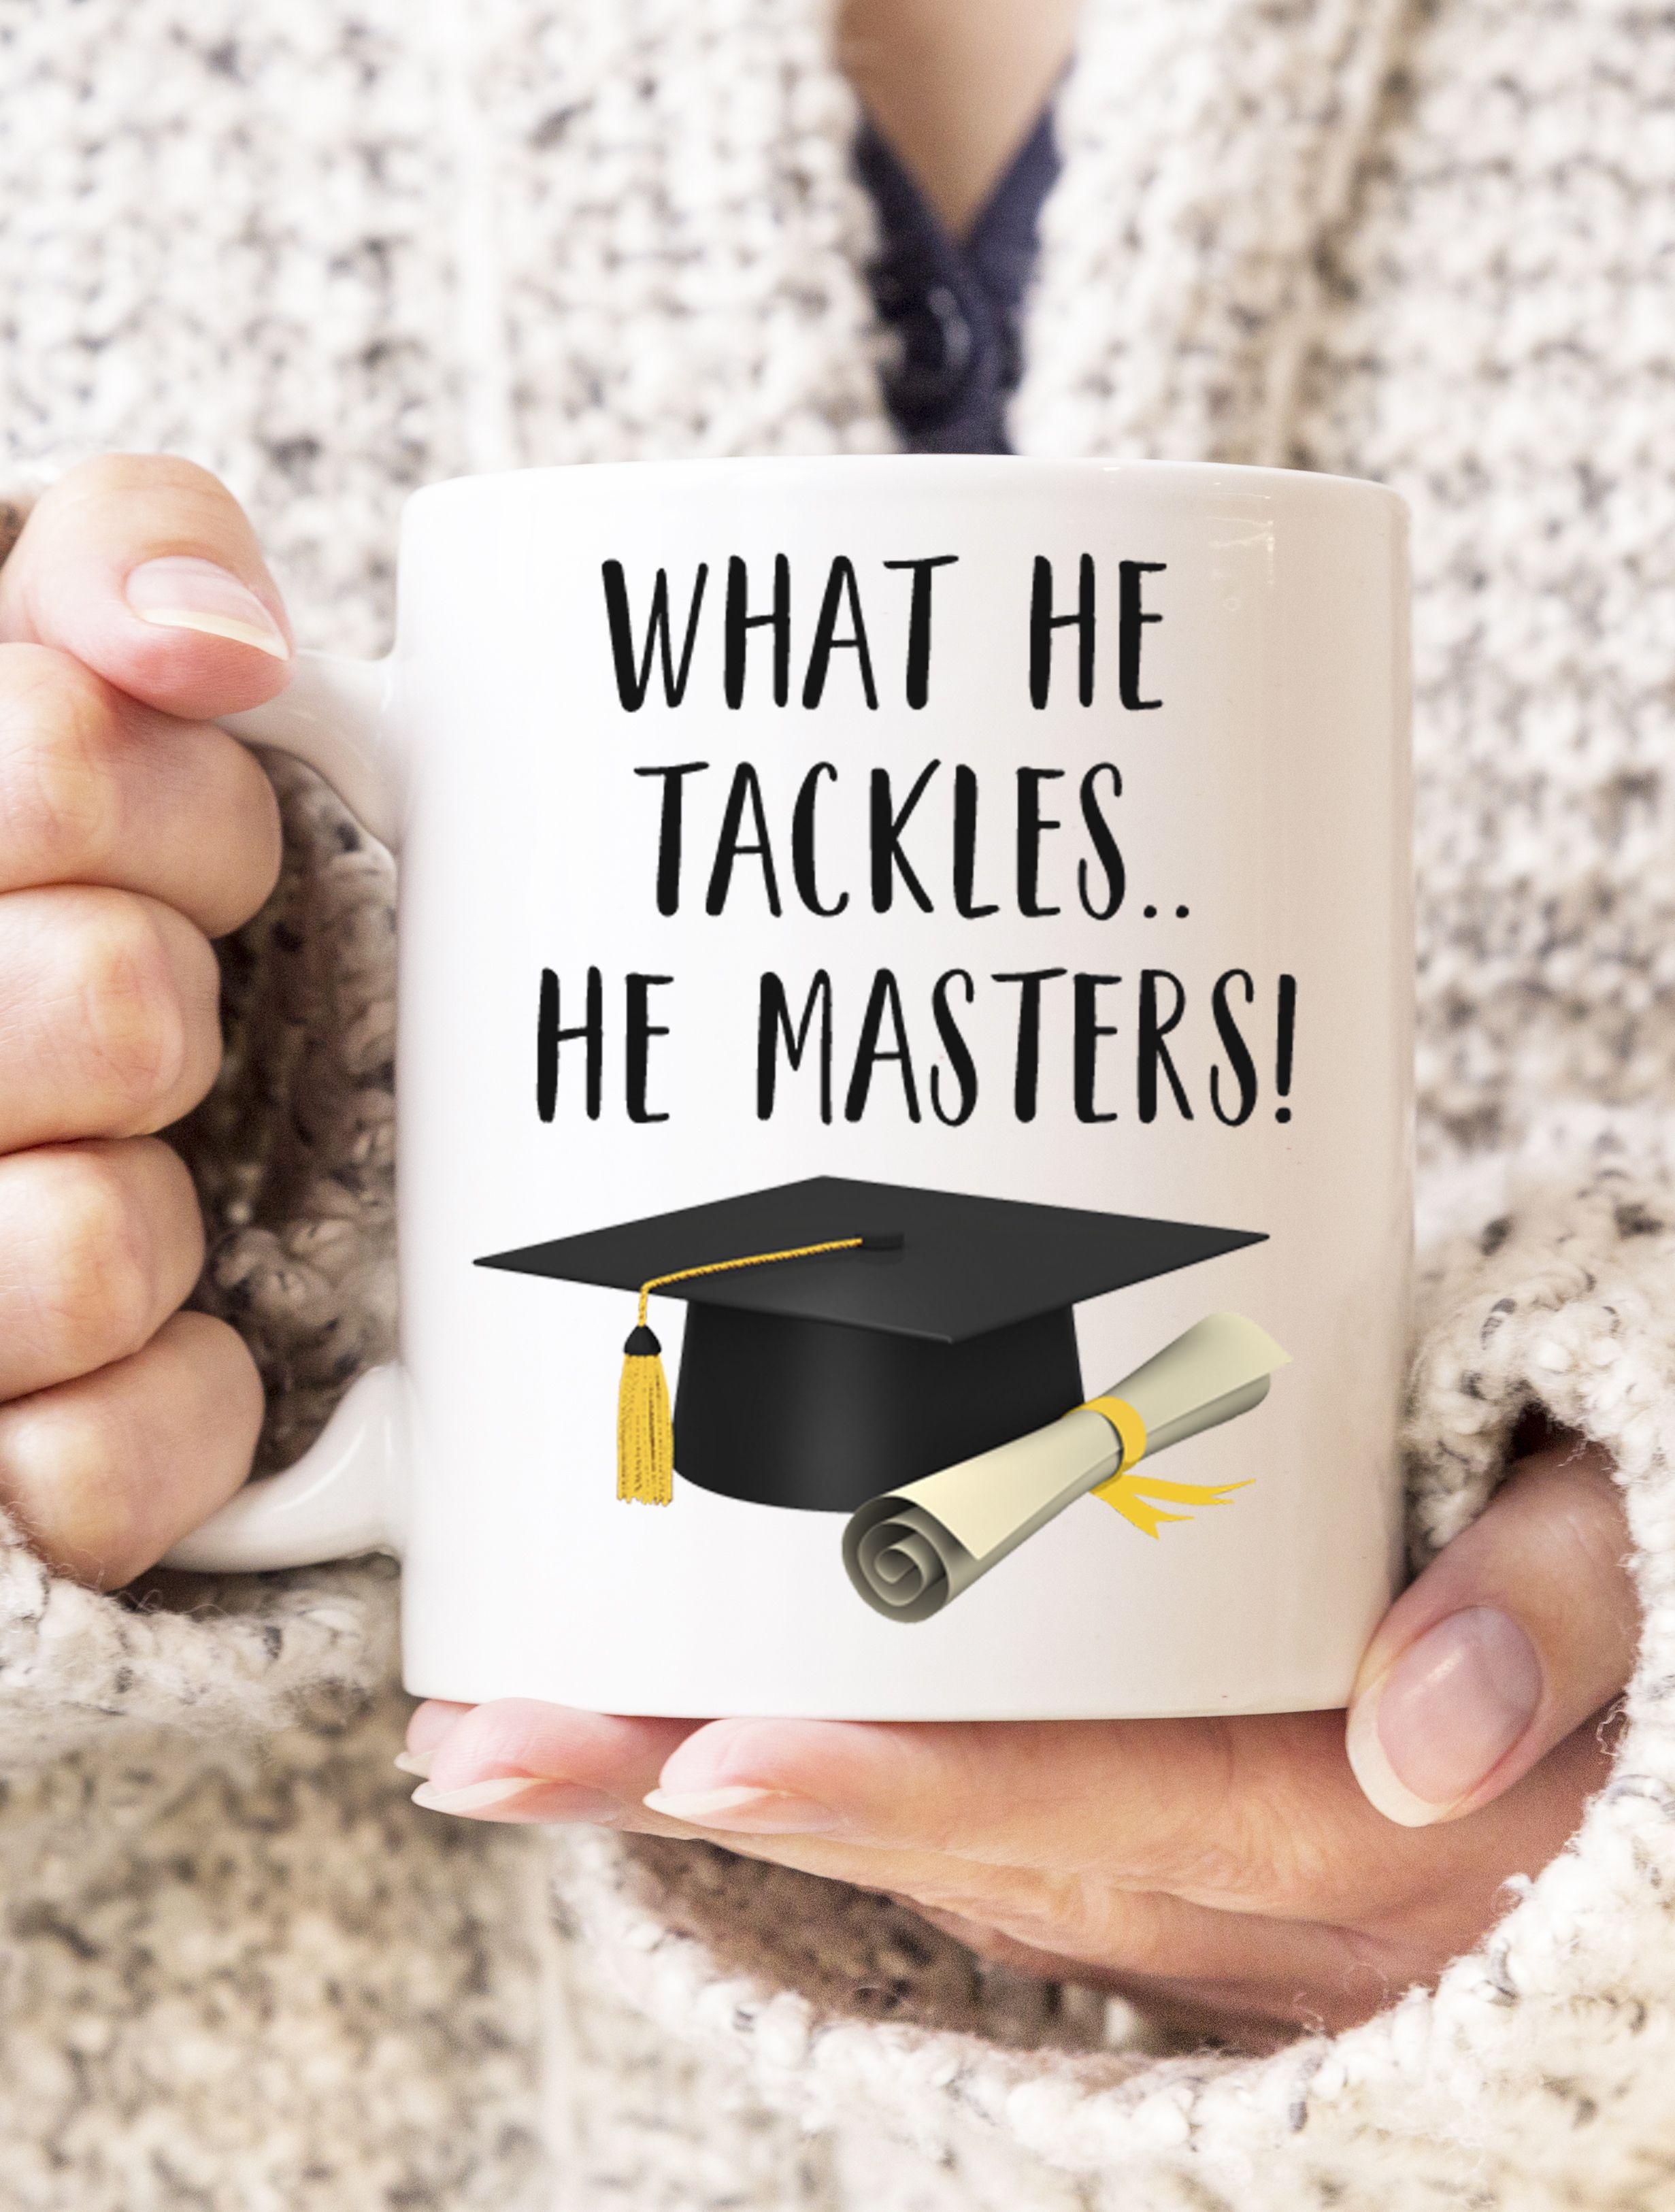 Graduation Gift For Son College Graduation Gift For Him | Etsy in 2021 | Graduation  gifts for him, Graduation gifts, College gifts